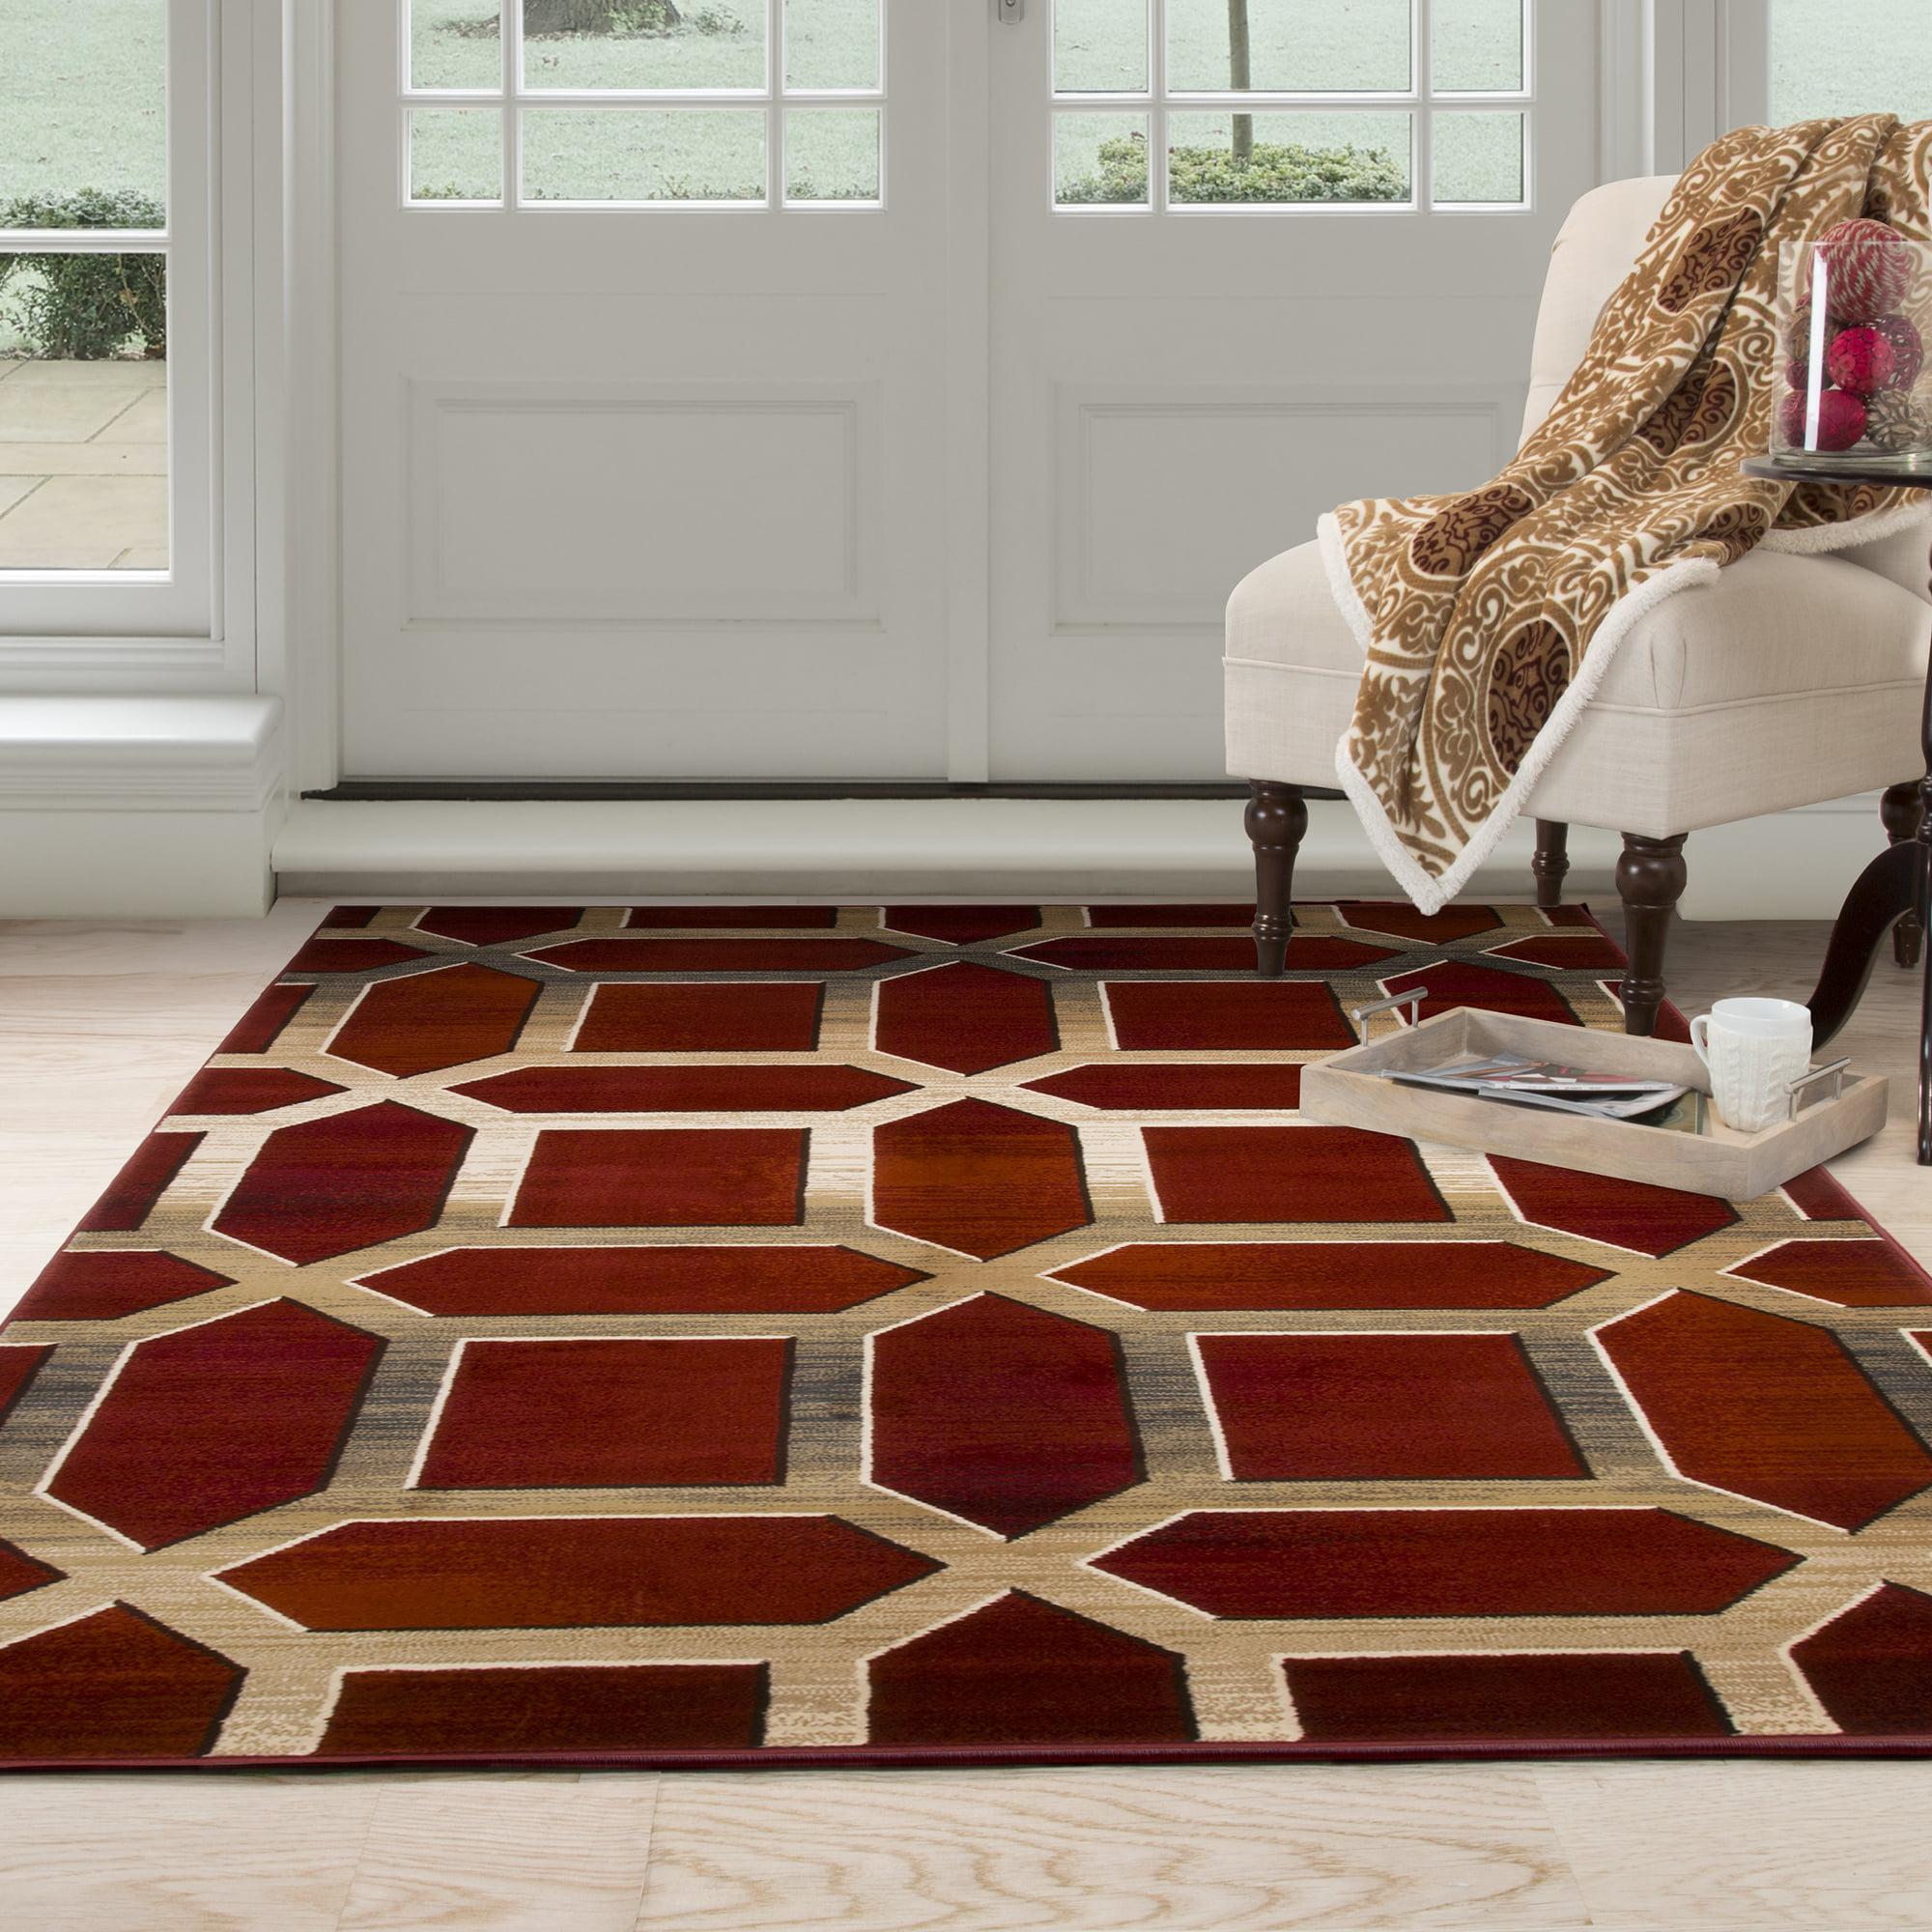 Lavish Home Opus Art Deco Area Rug 8 X 10 Burgundy Walmart